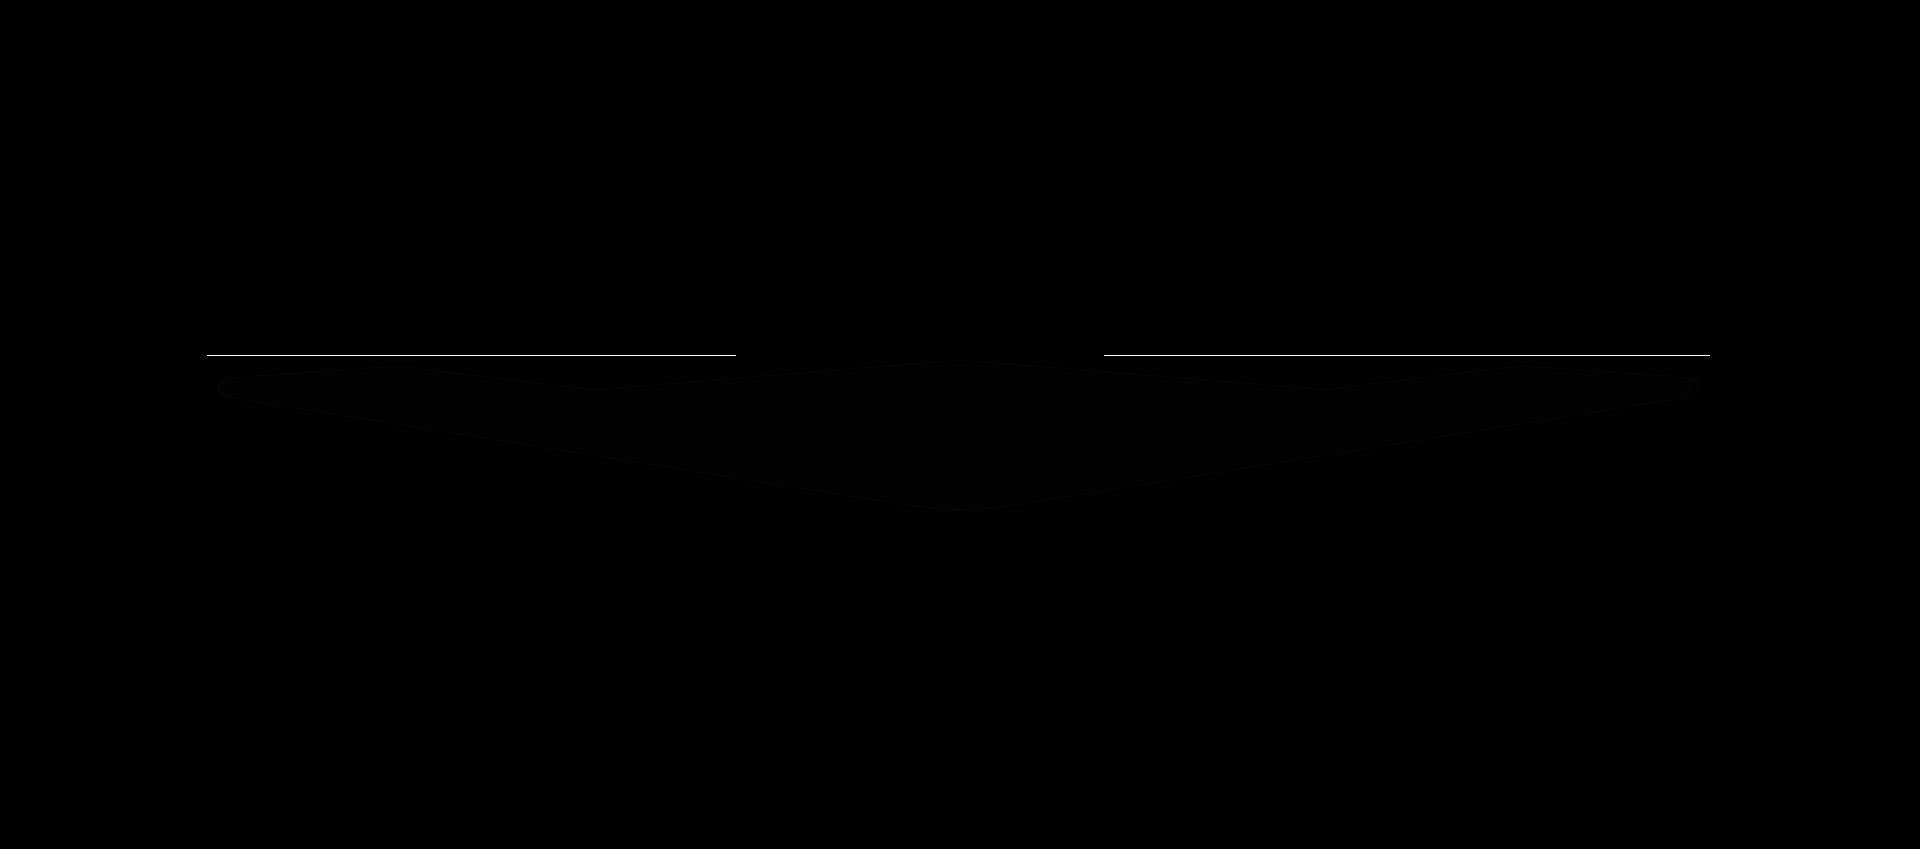 B-21 Shadow